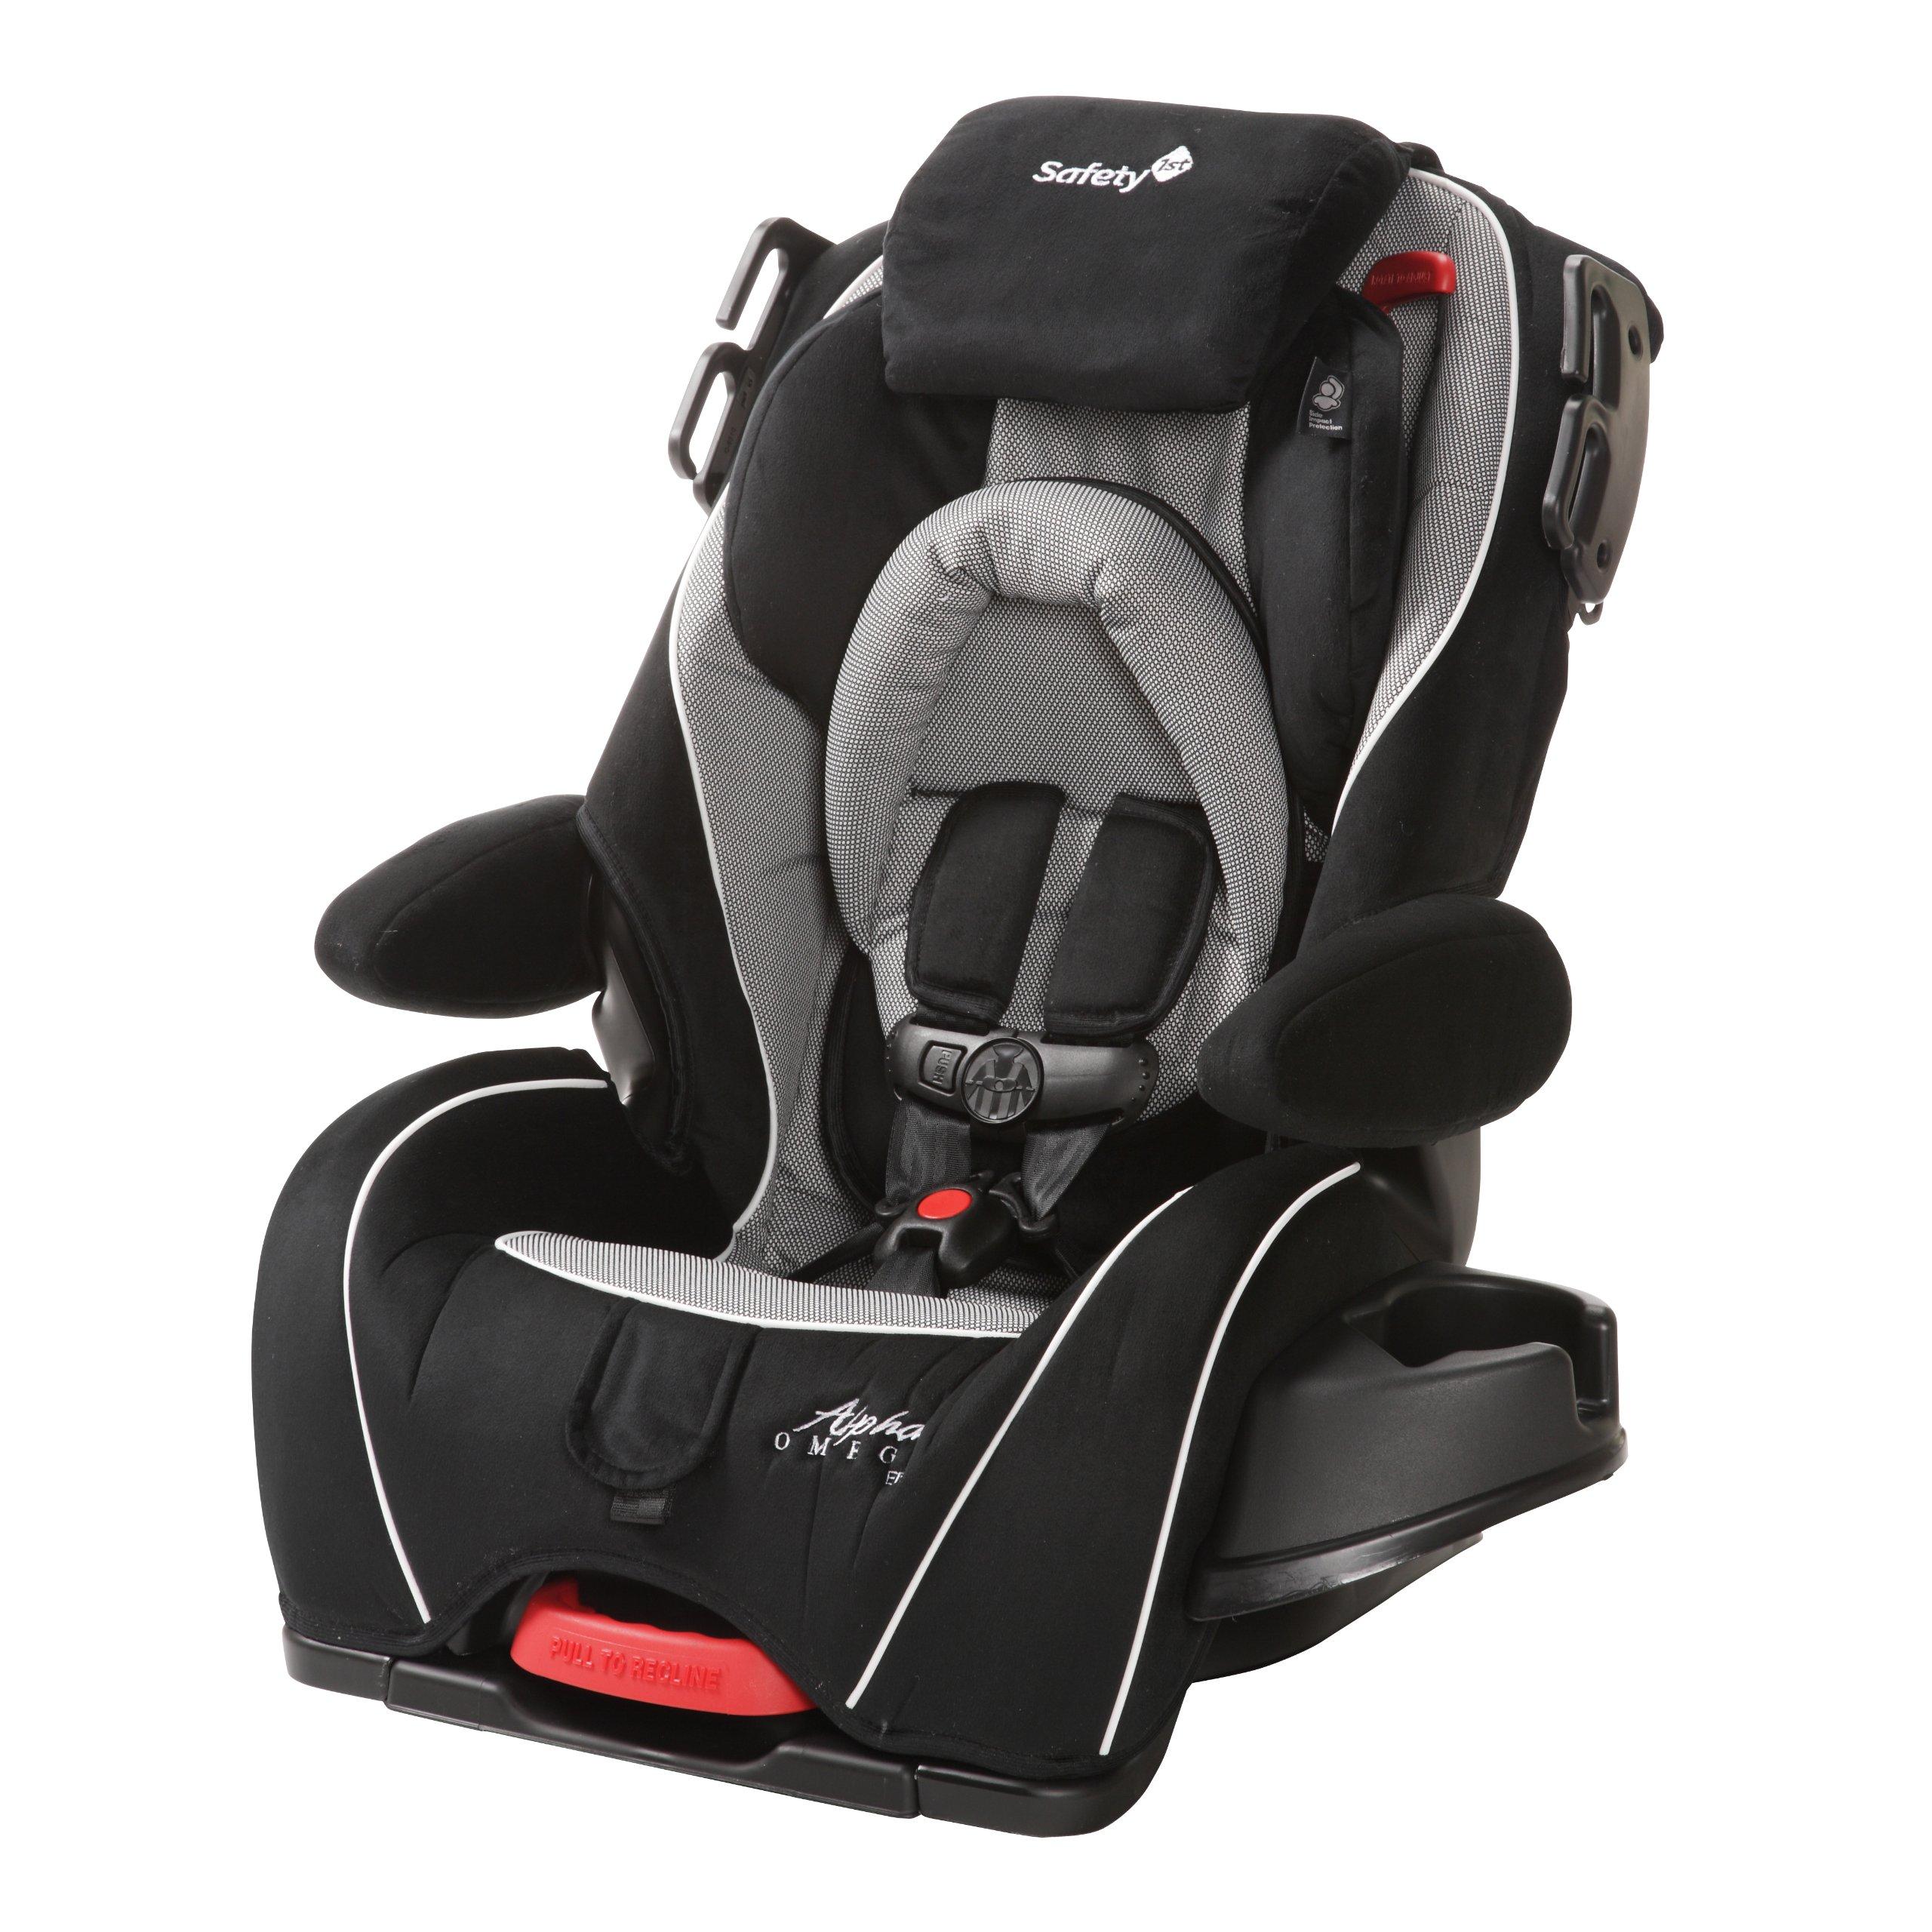 Safety 1st Alpha Omega Elite Convertible Car Seat, Quartz